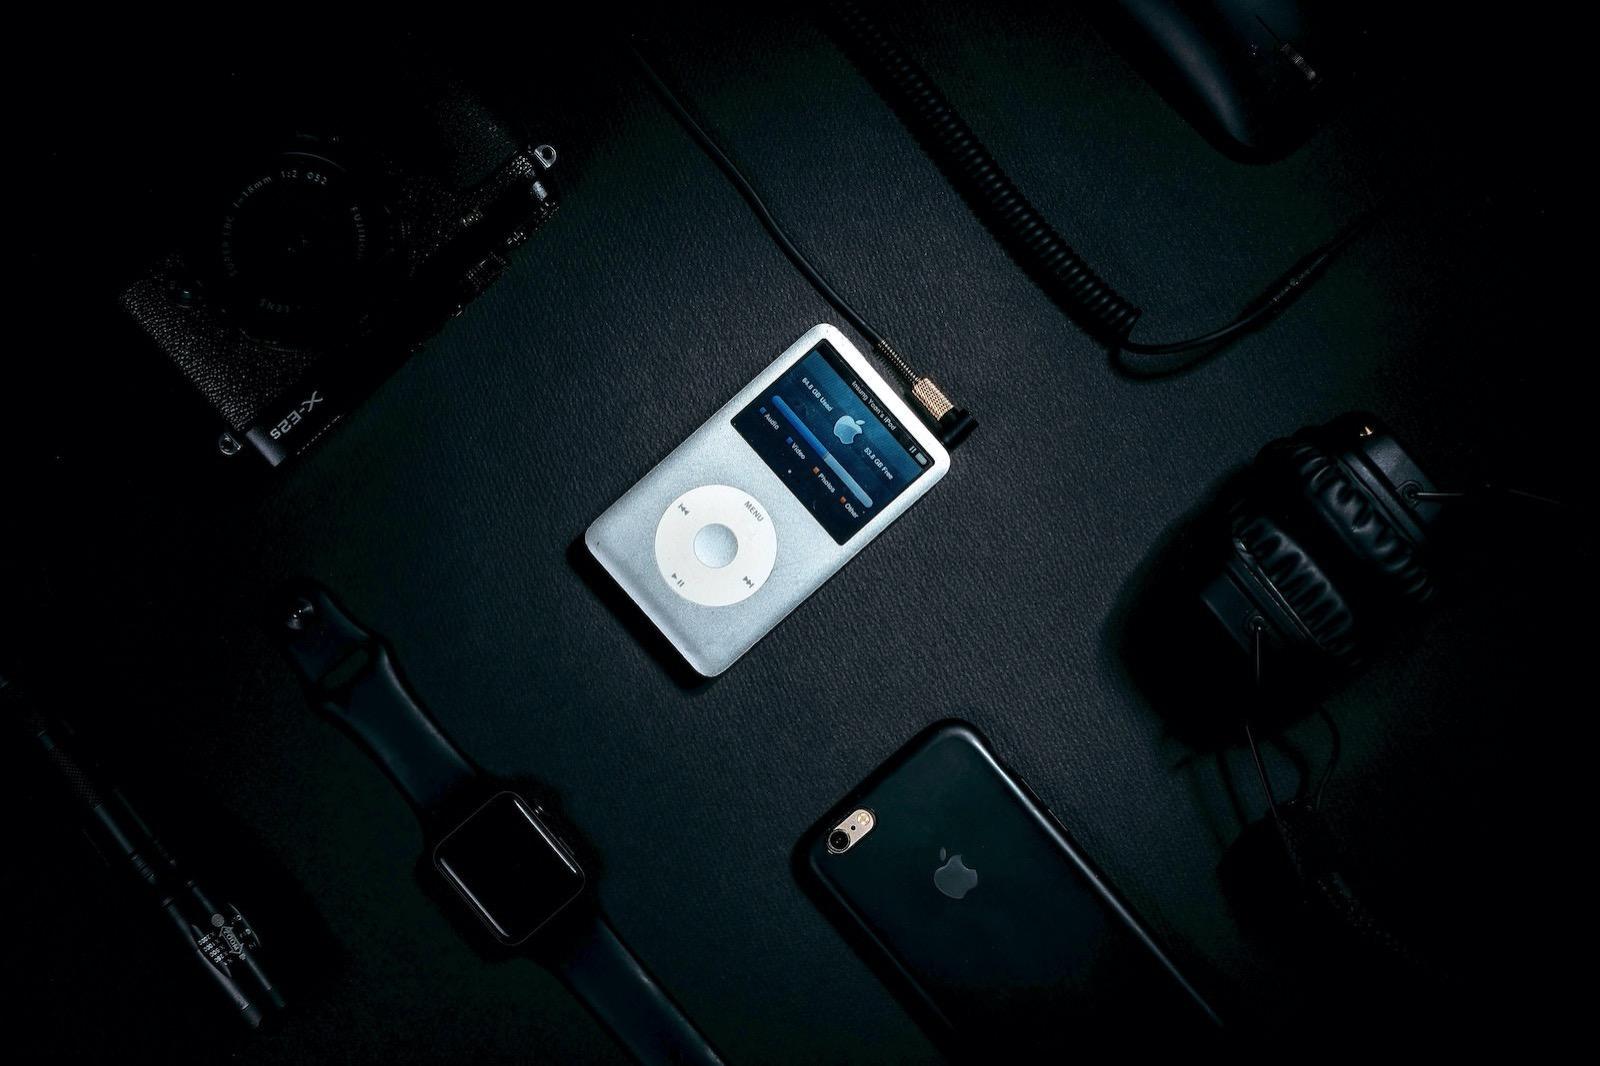 Insung yoon 2uGNgqKIvNo unsplash ipods